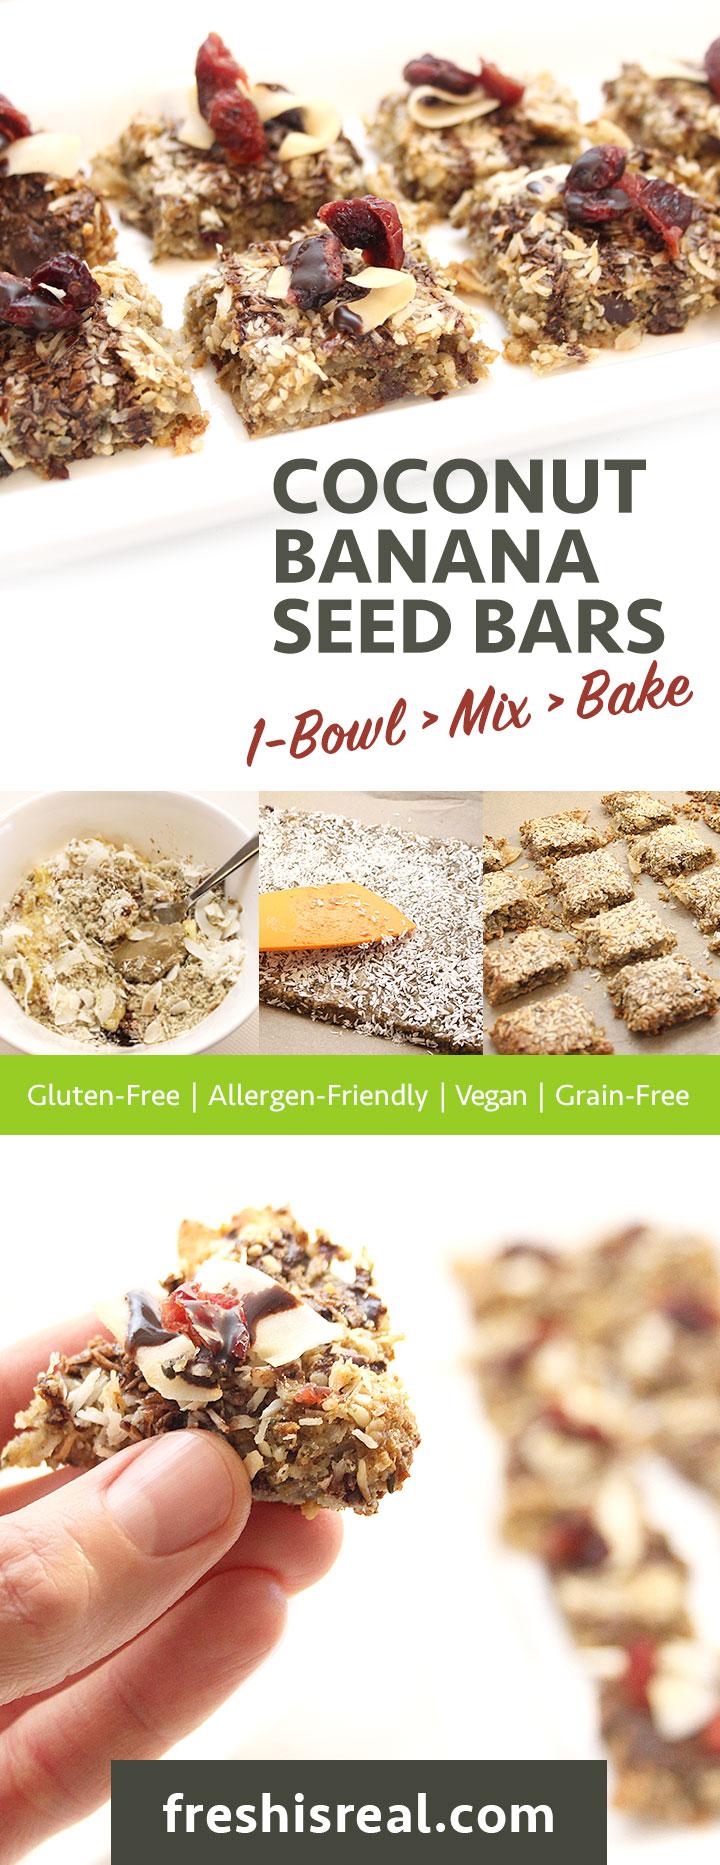 >> Must try Coconut Banana Seed Bars recipe! 1-Bowl > Mix > Bake - Ready in 45 minutes. Gluten-Free | Allergen-Friendly | Vegan | Grain-Free #freshisreal #healthytreats